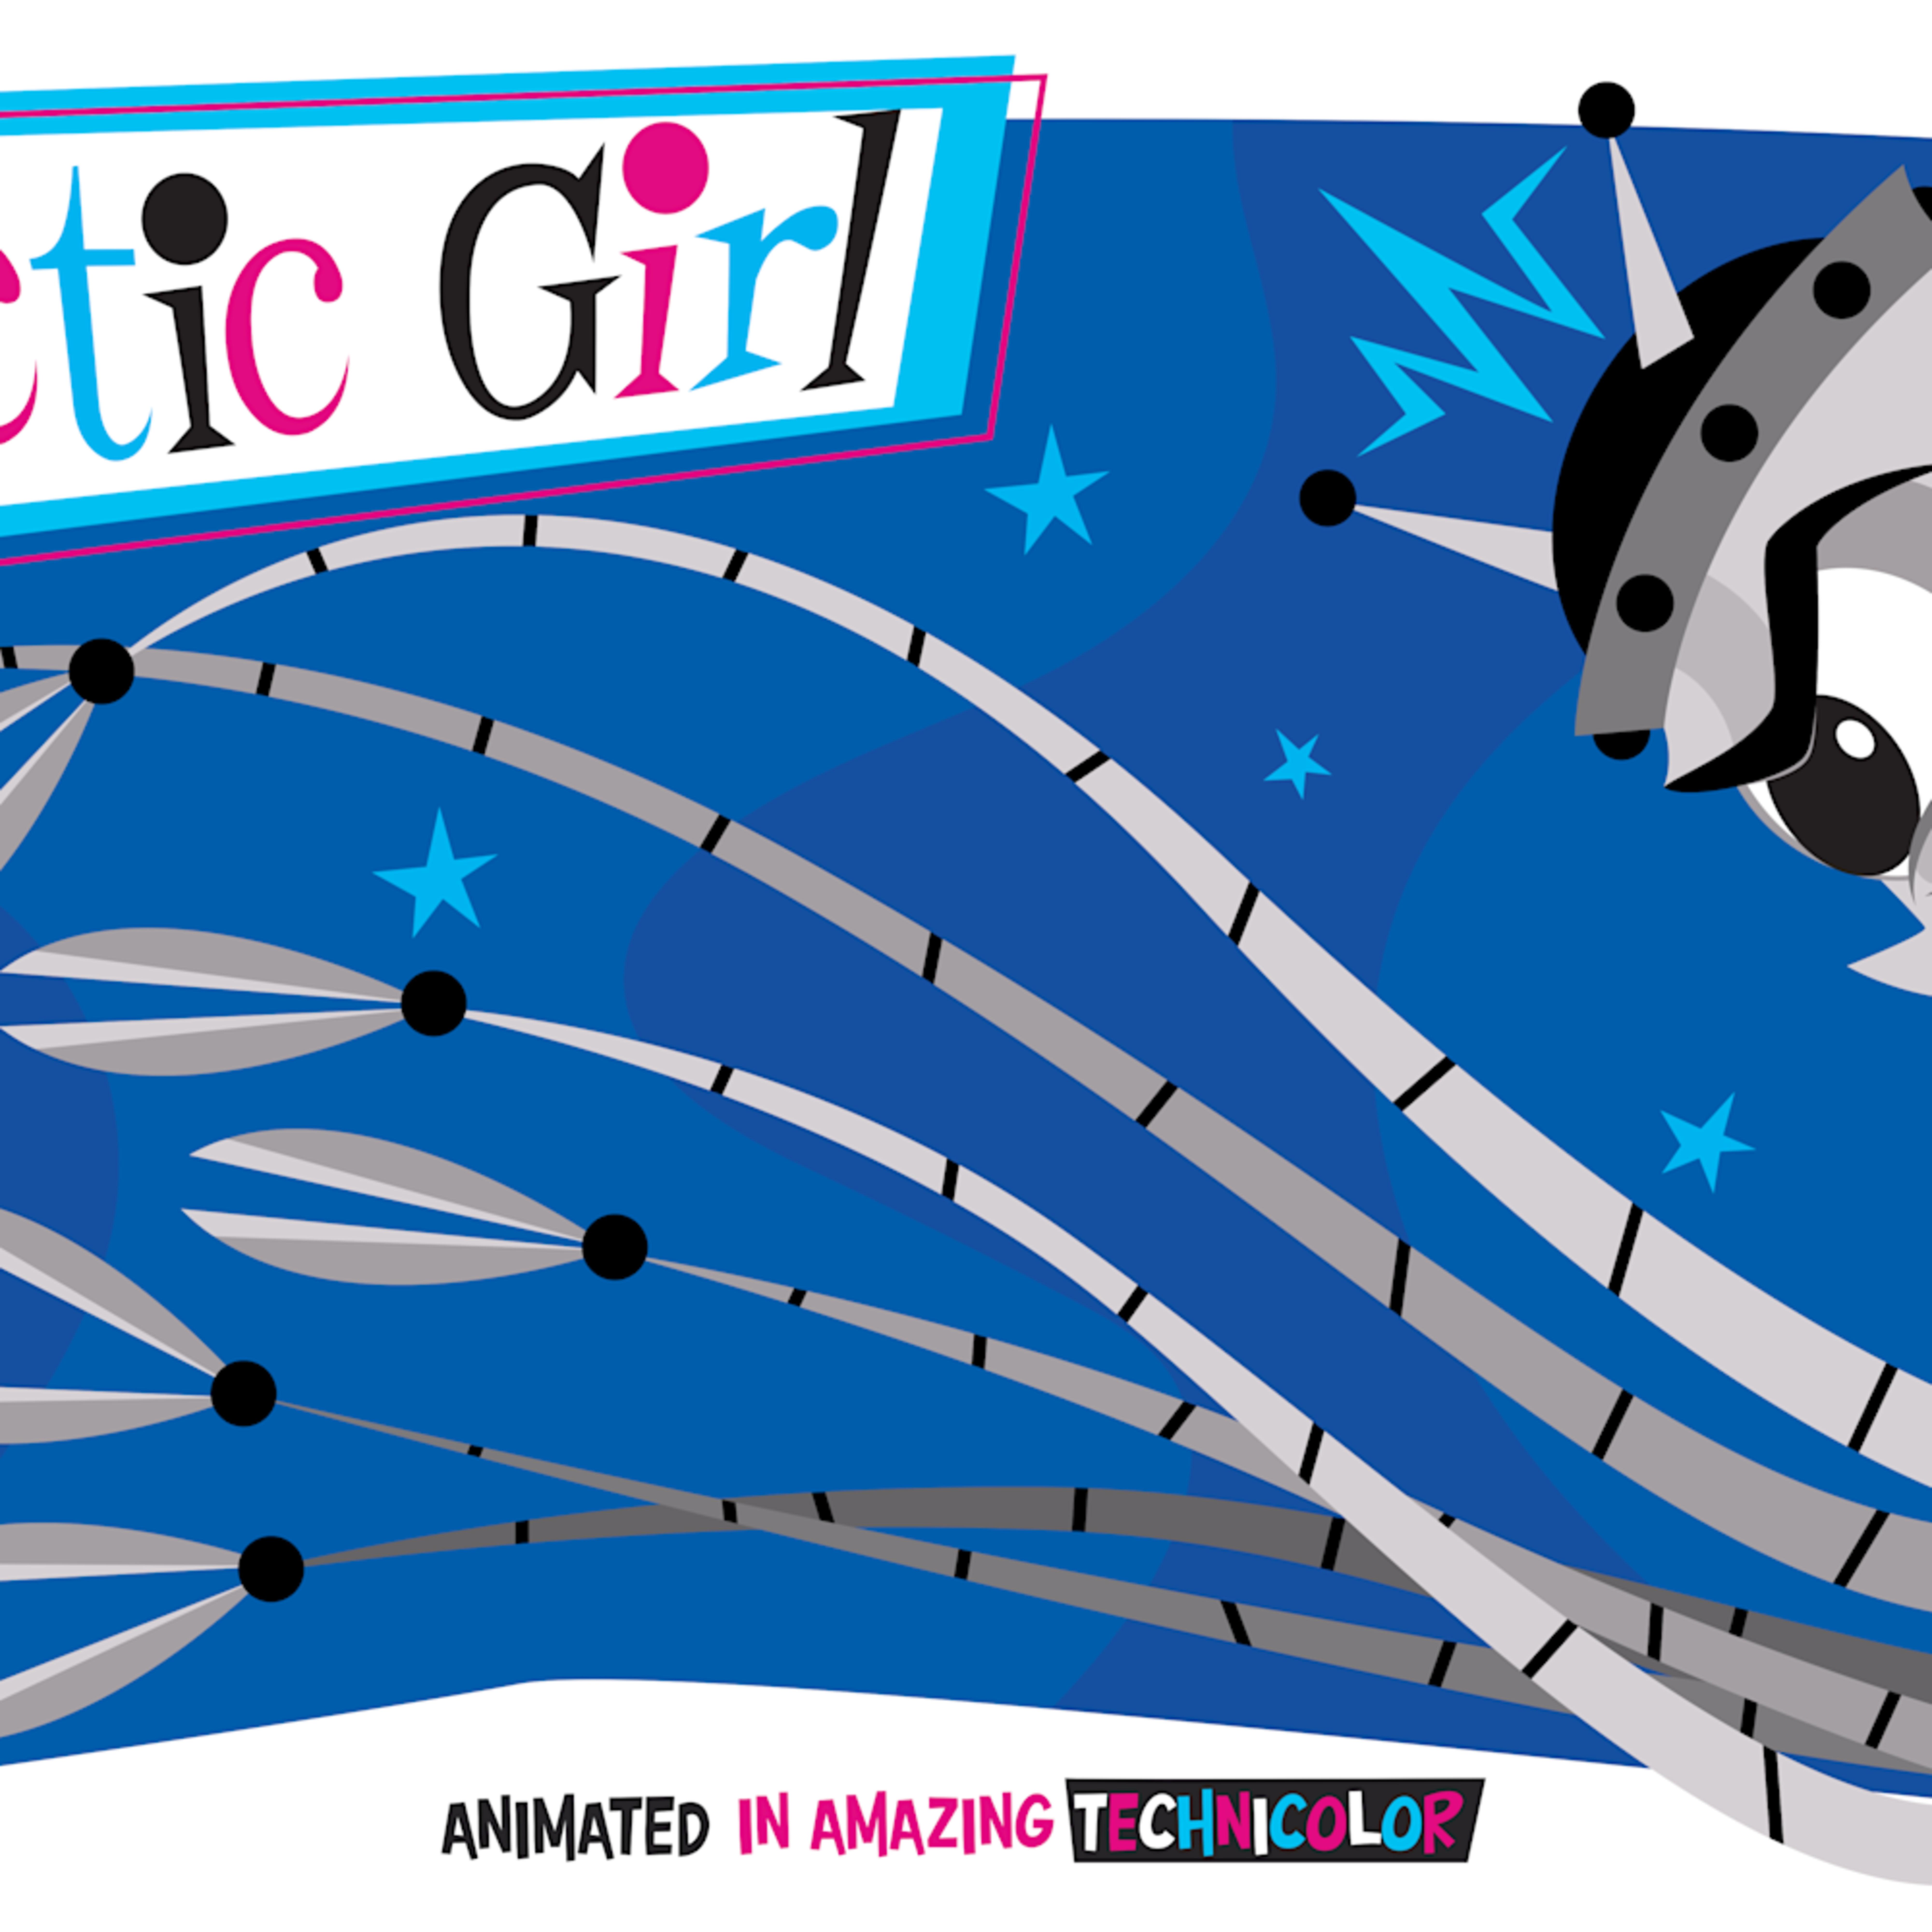 Galactic girl vs squidbot qqnr0o